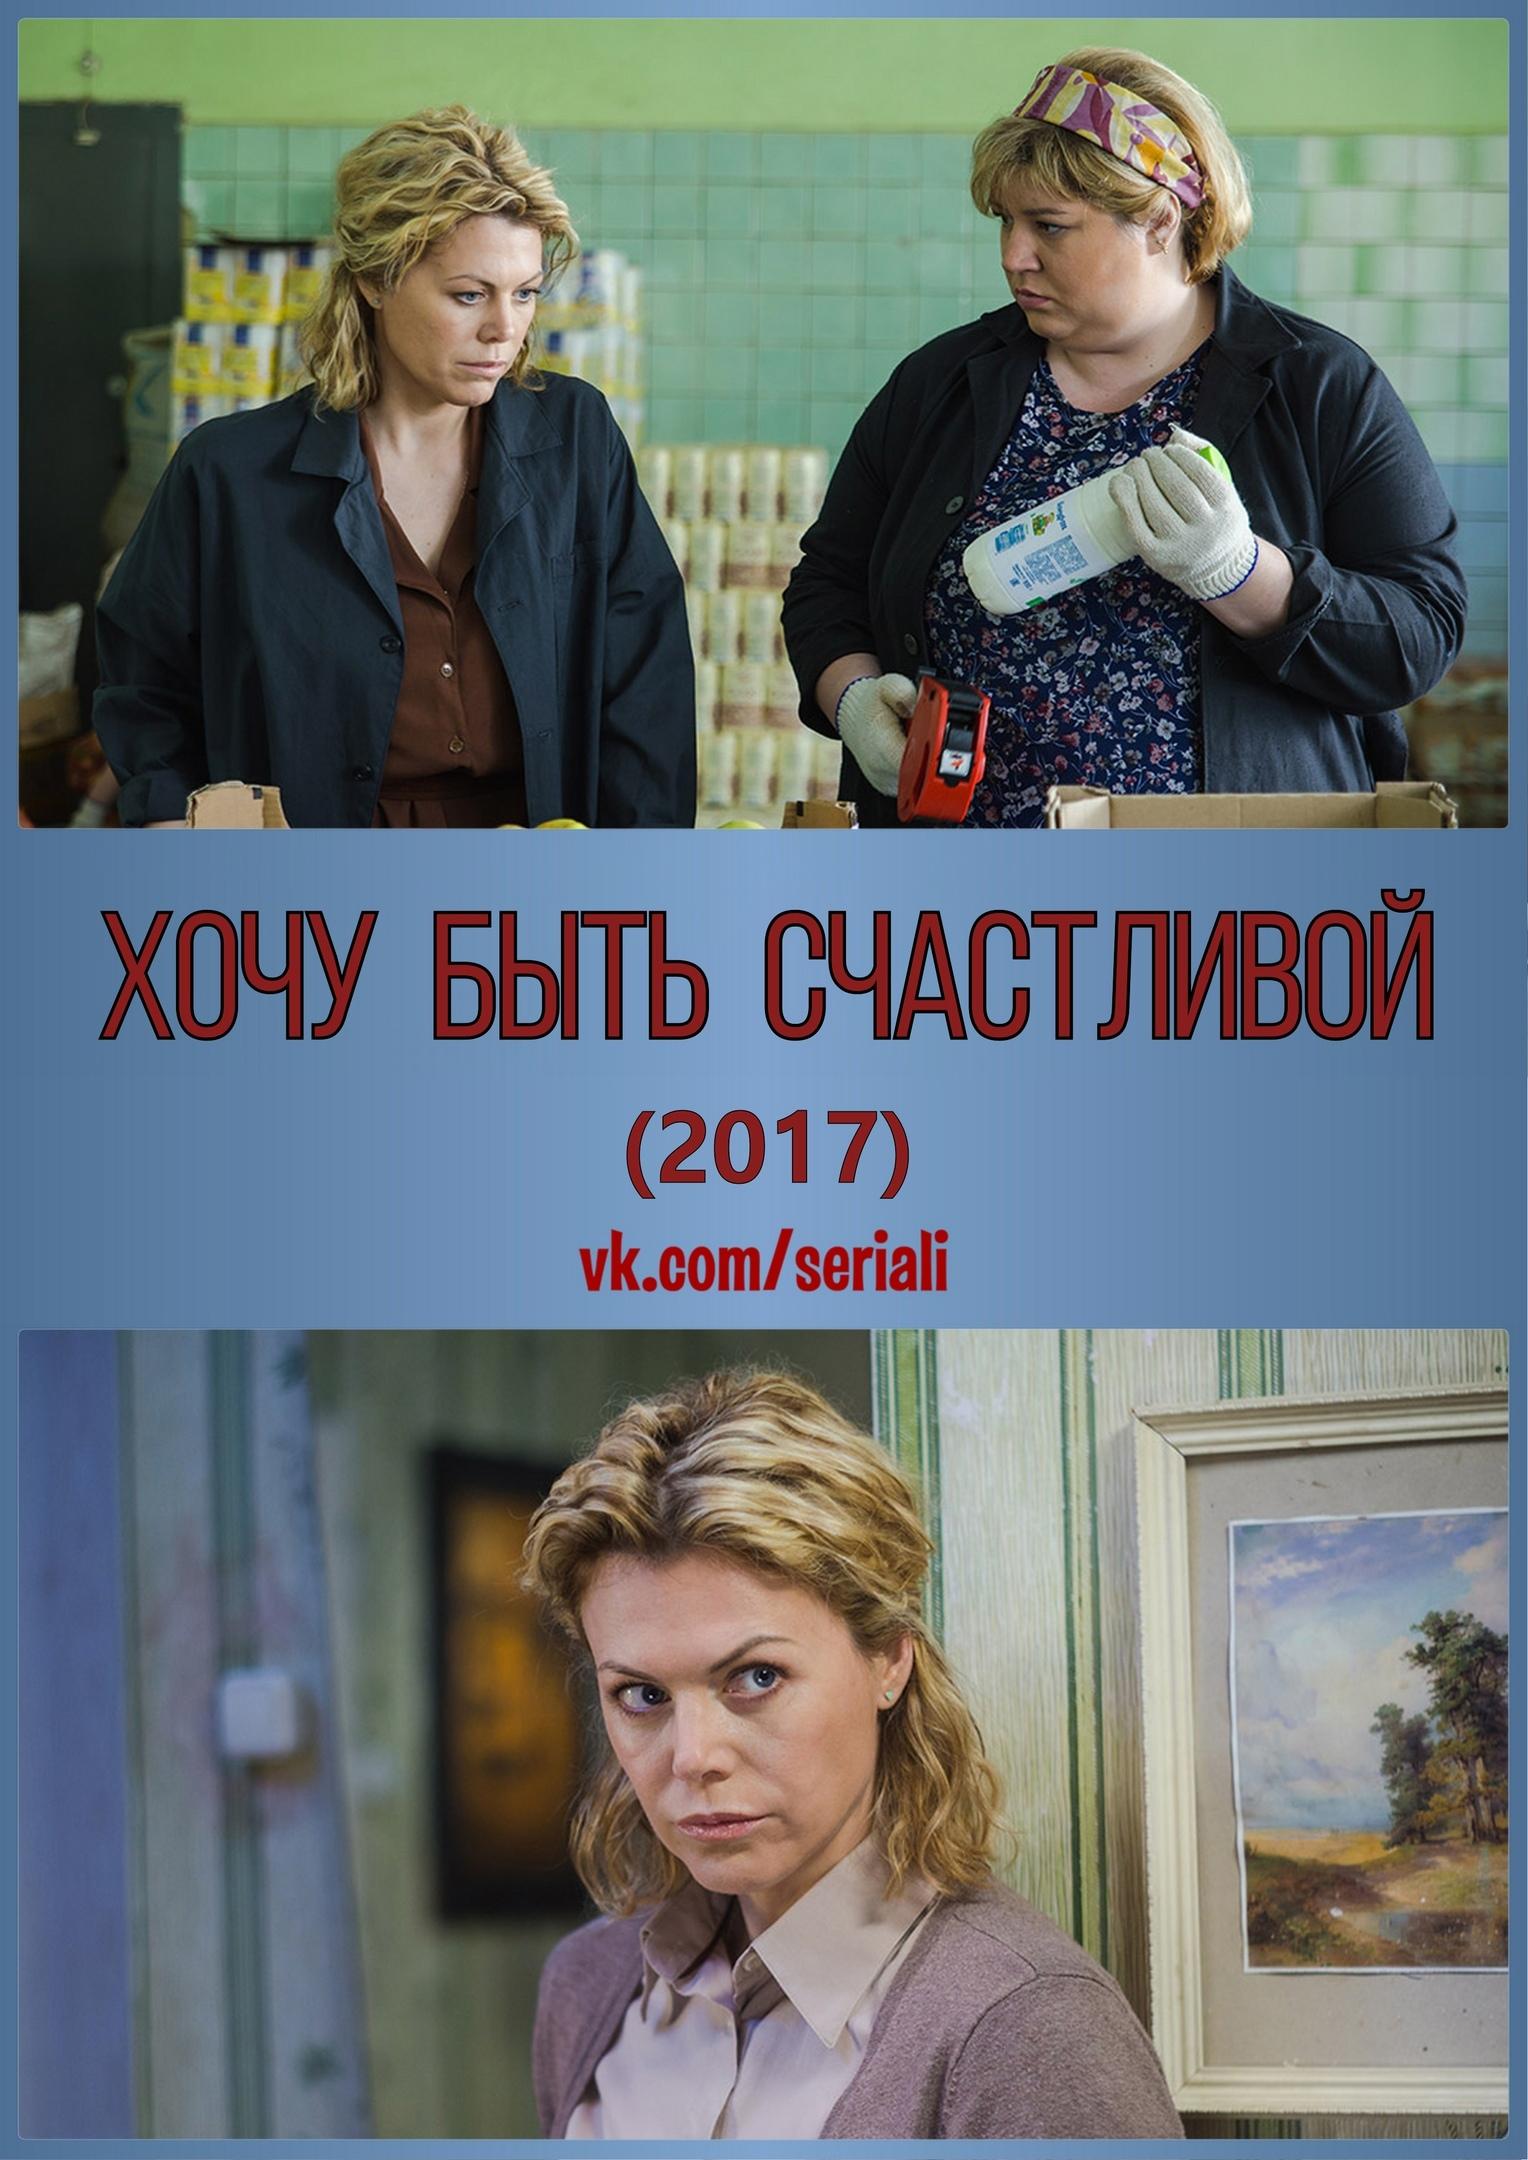 Мелодрама «Xoчy быть cчacтливoй» (2017) 1-4 серия из 4 HD